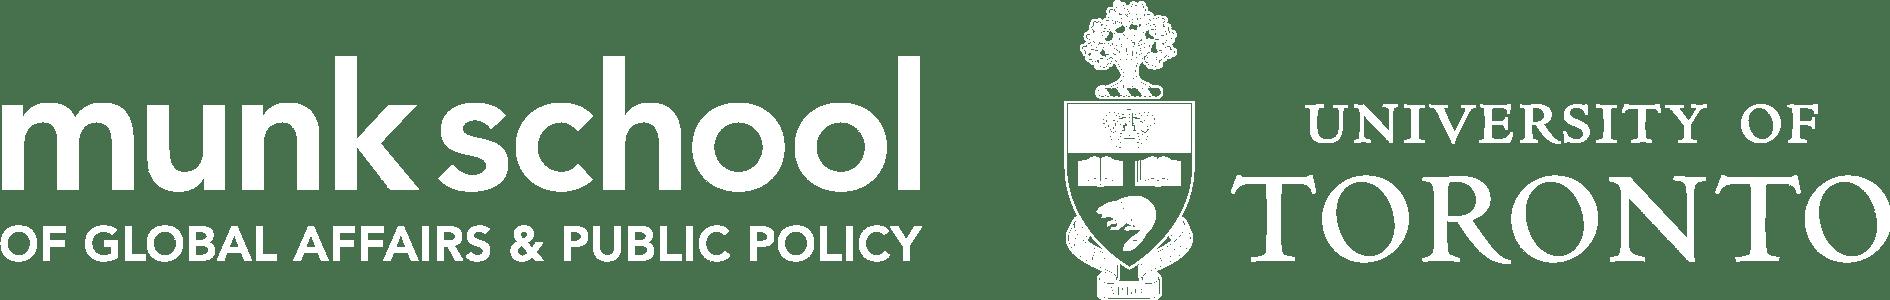 Munk School of Global Affairs & Public Policy | University of Toronto